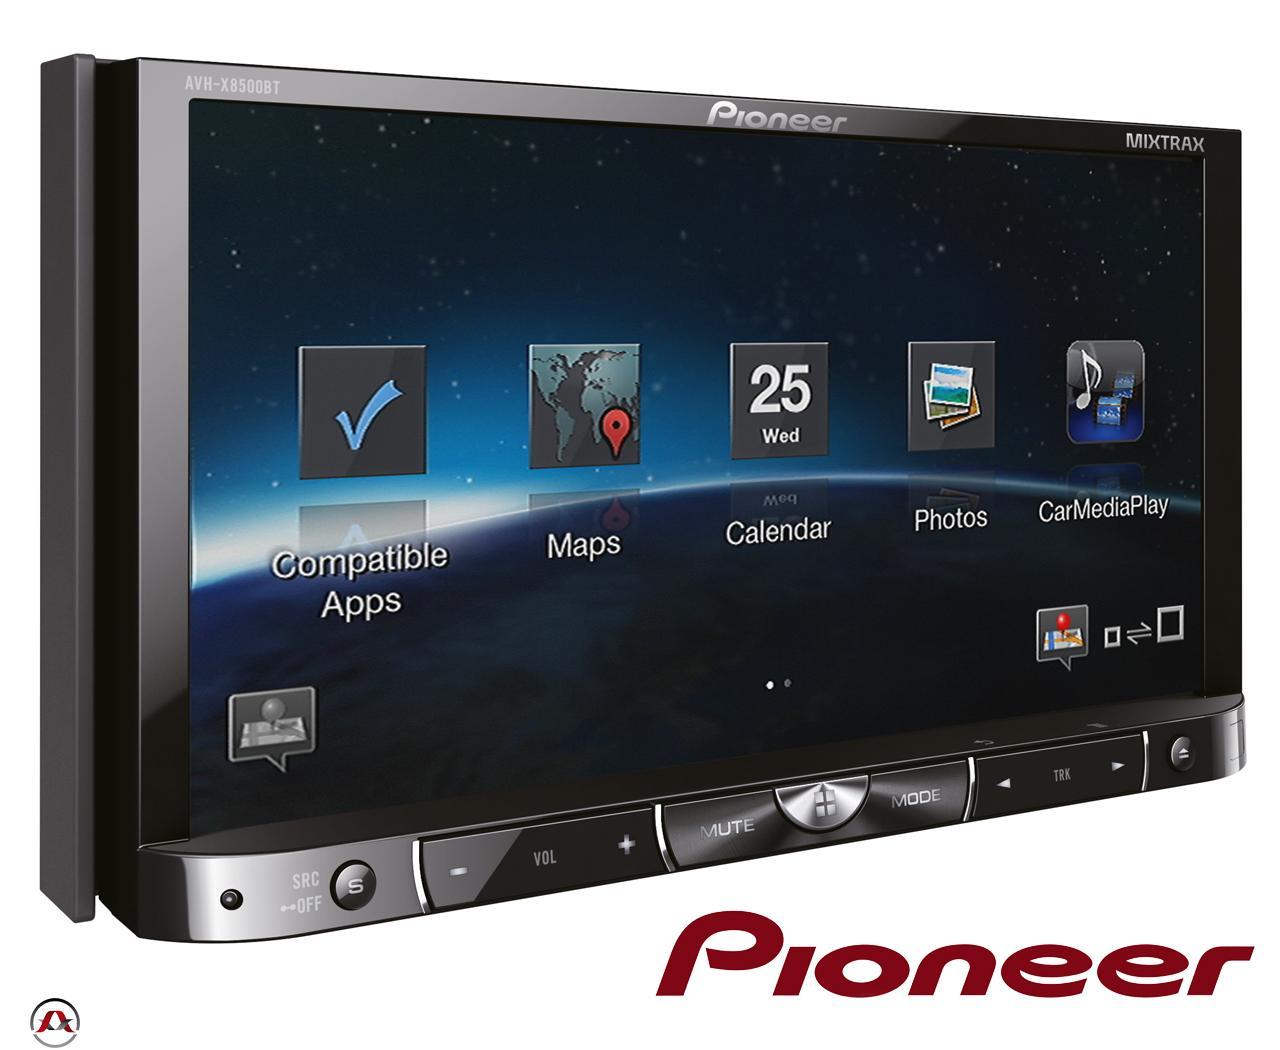 Autoradio Pioneer 3200 Dvd Assassins Creed 4 Black Flag Trailer Avh P3200dvd Installation Manual Car Receivers P3200bt P4200dvd Online Reading And Free